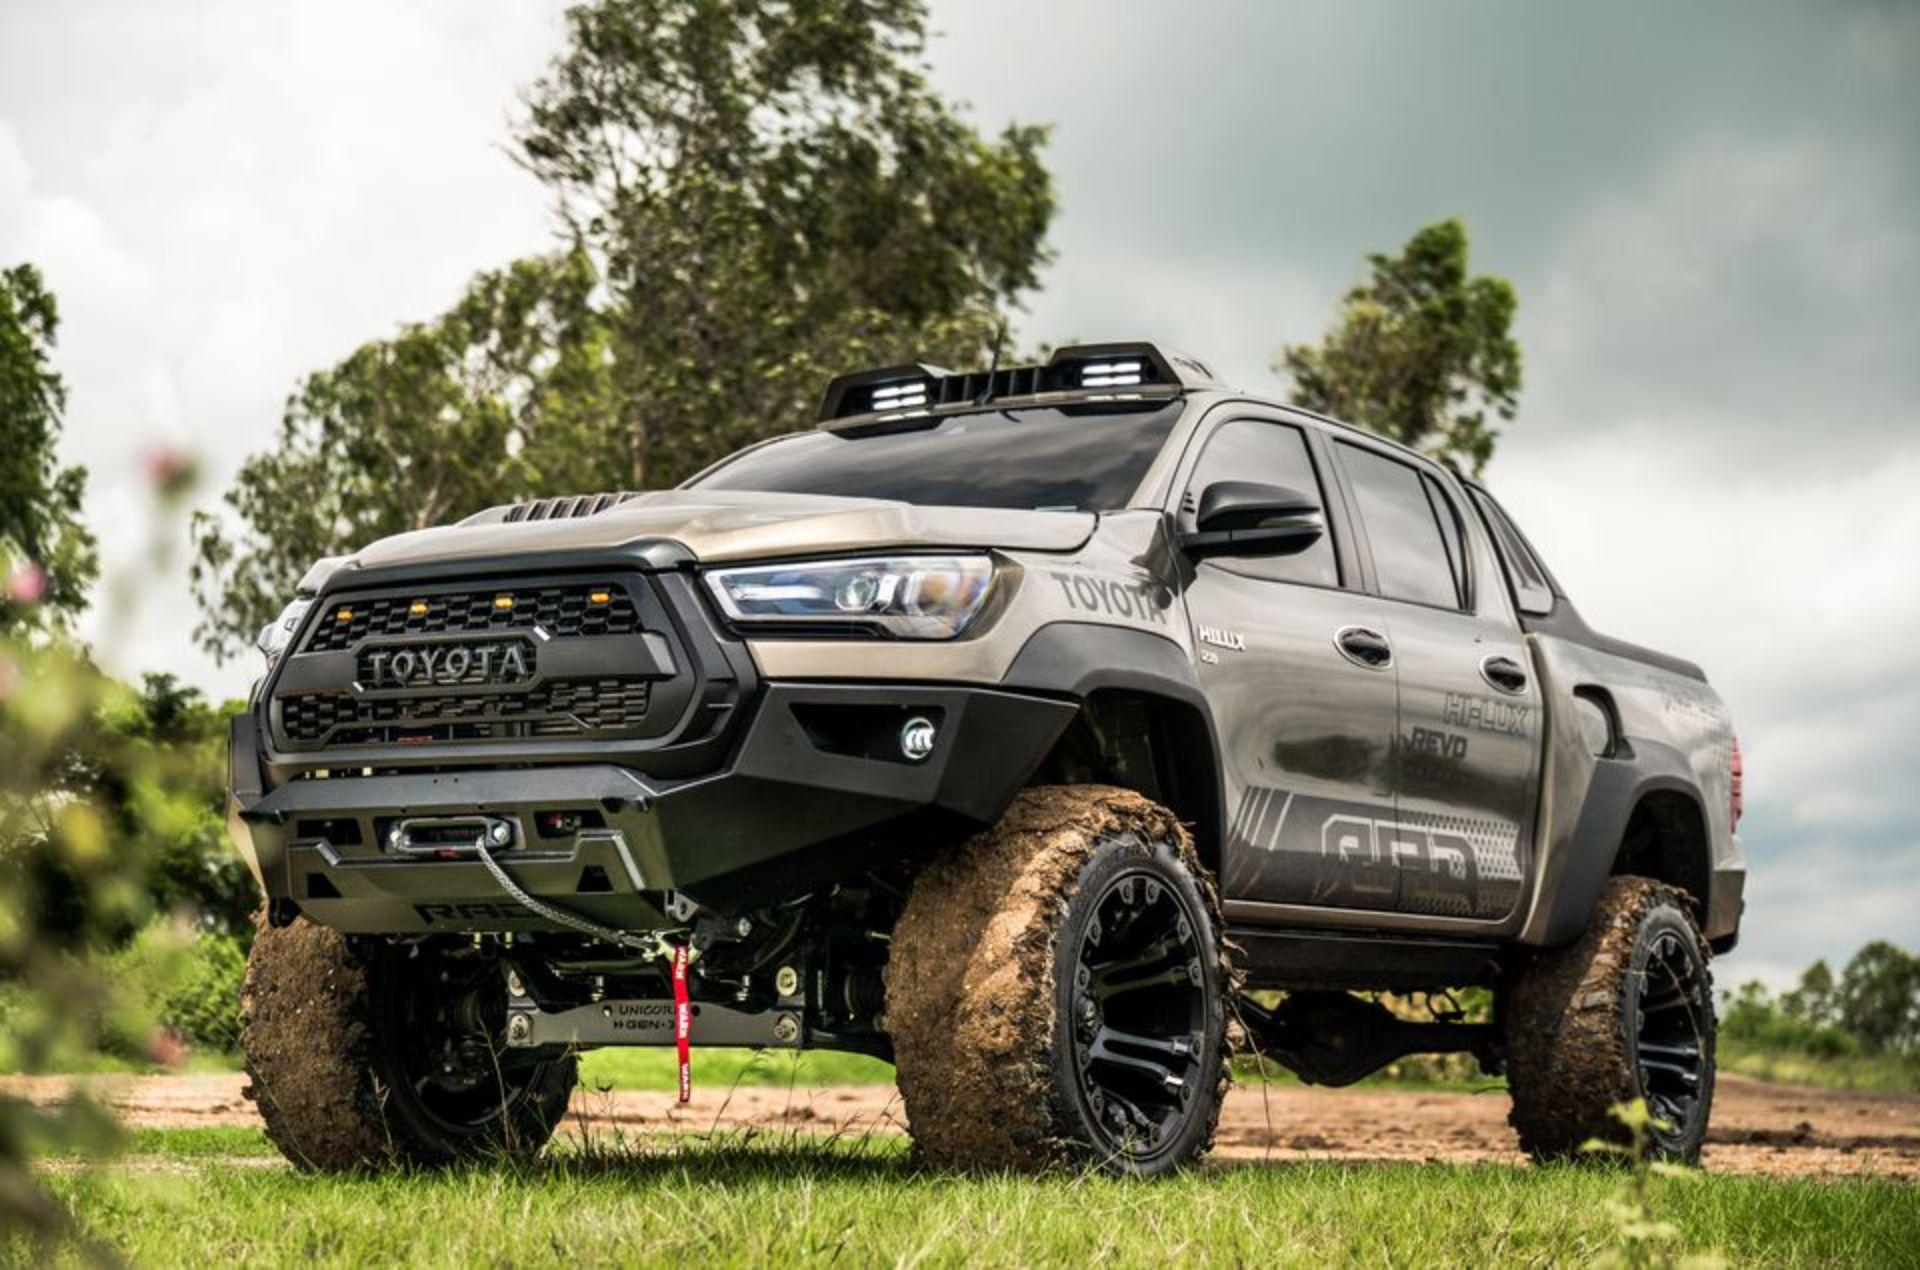 Toyota-Hilux-Pathfinder-by-RAD-4